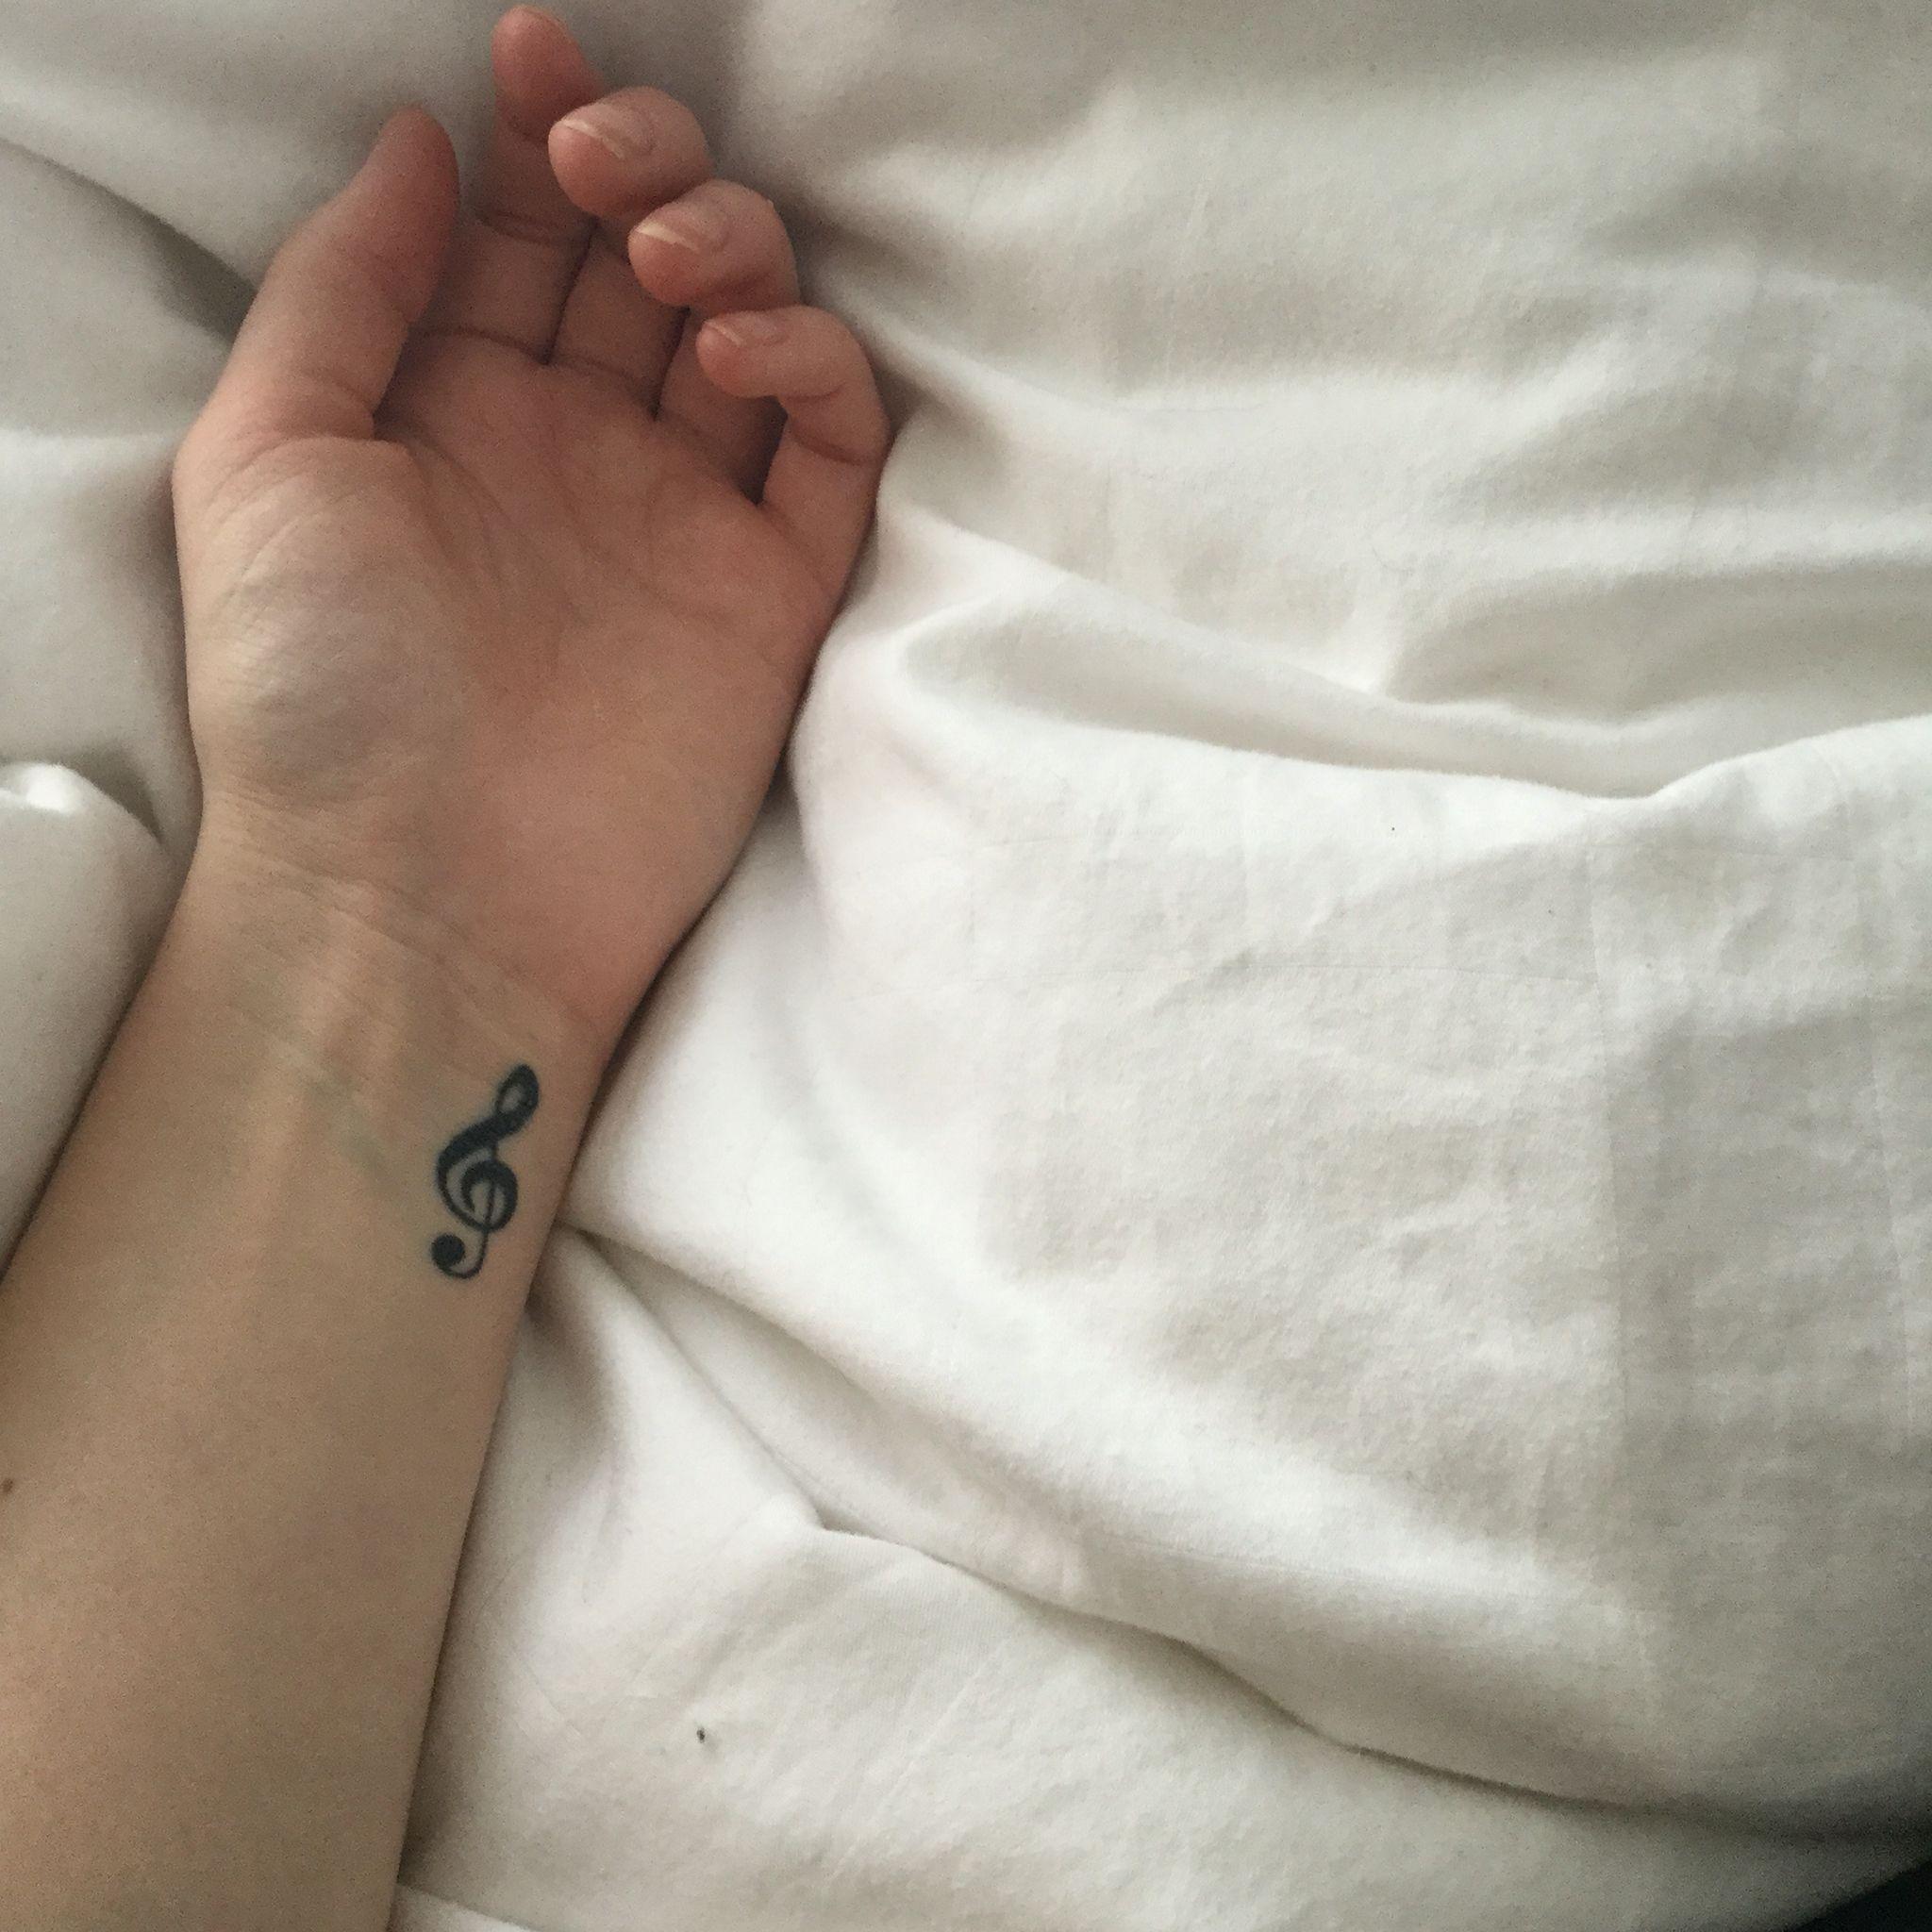 My treble clef tattoo. Music note